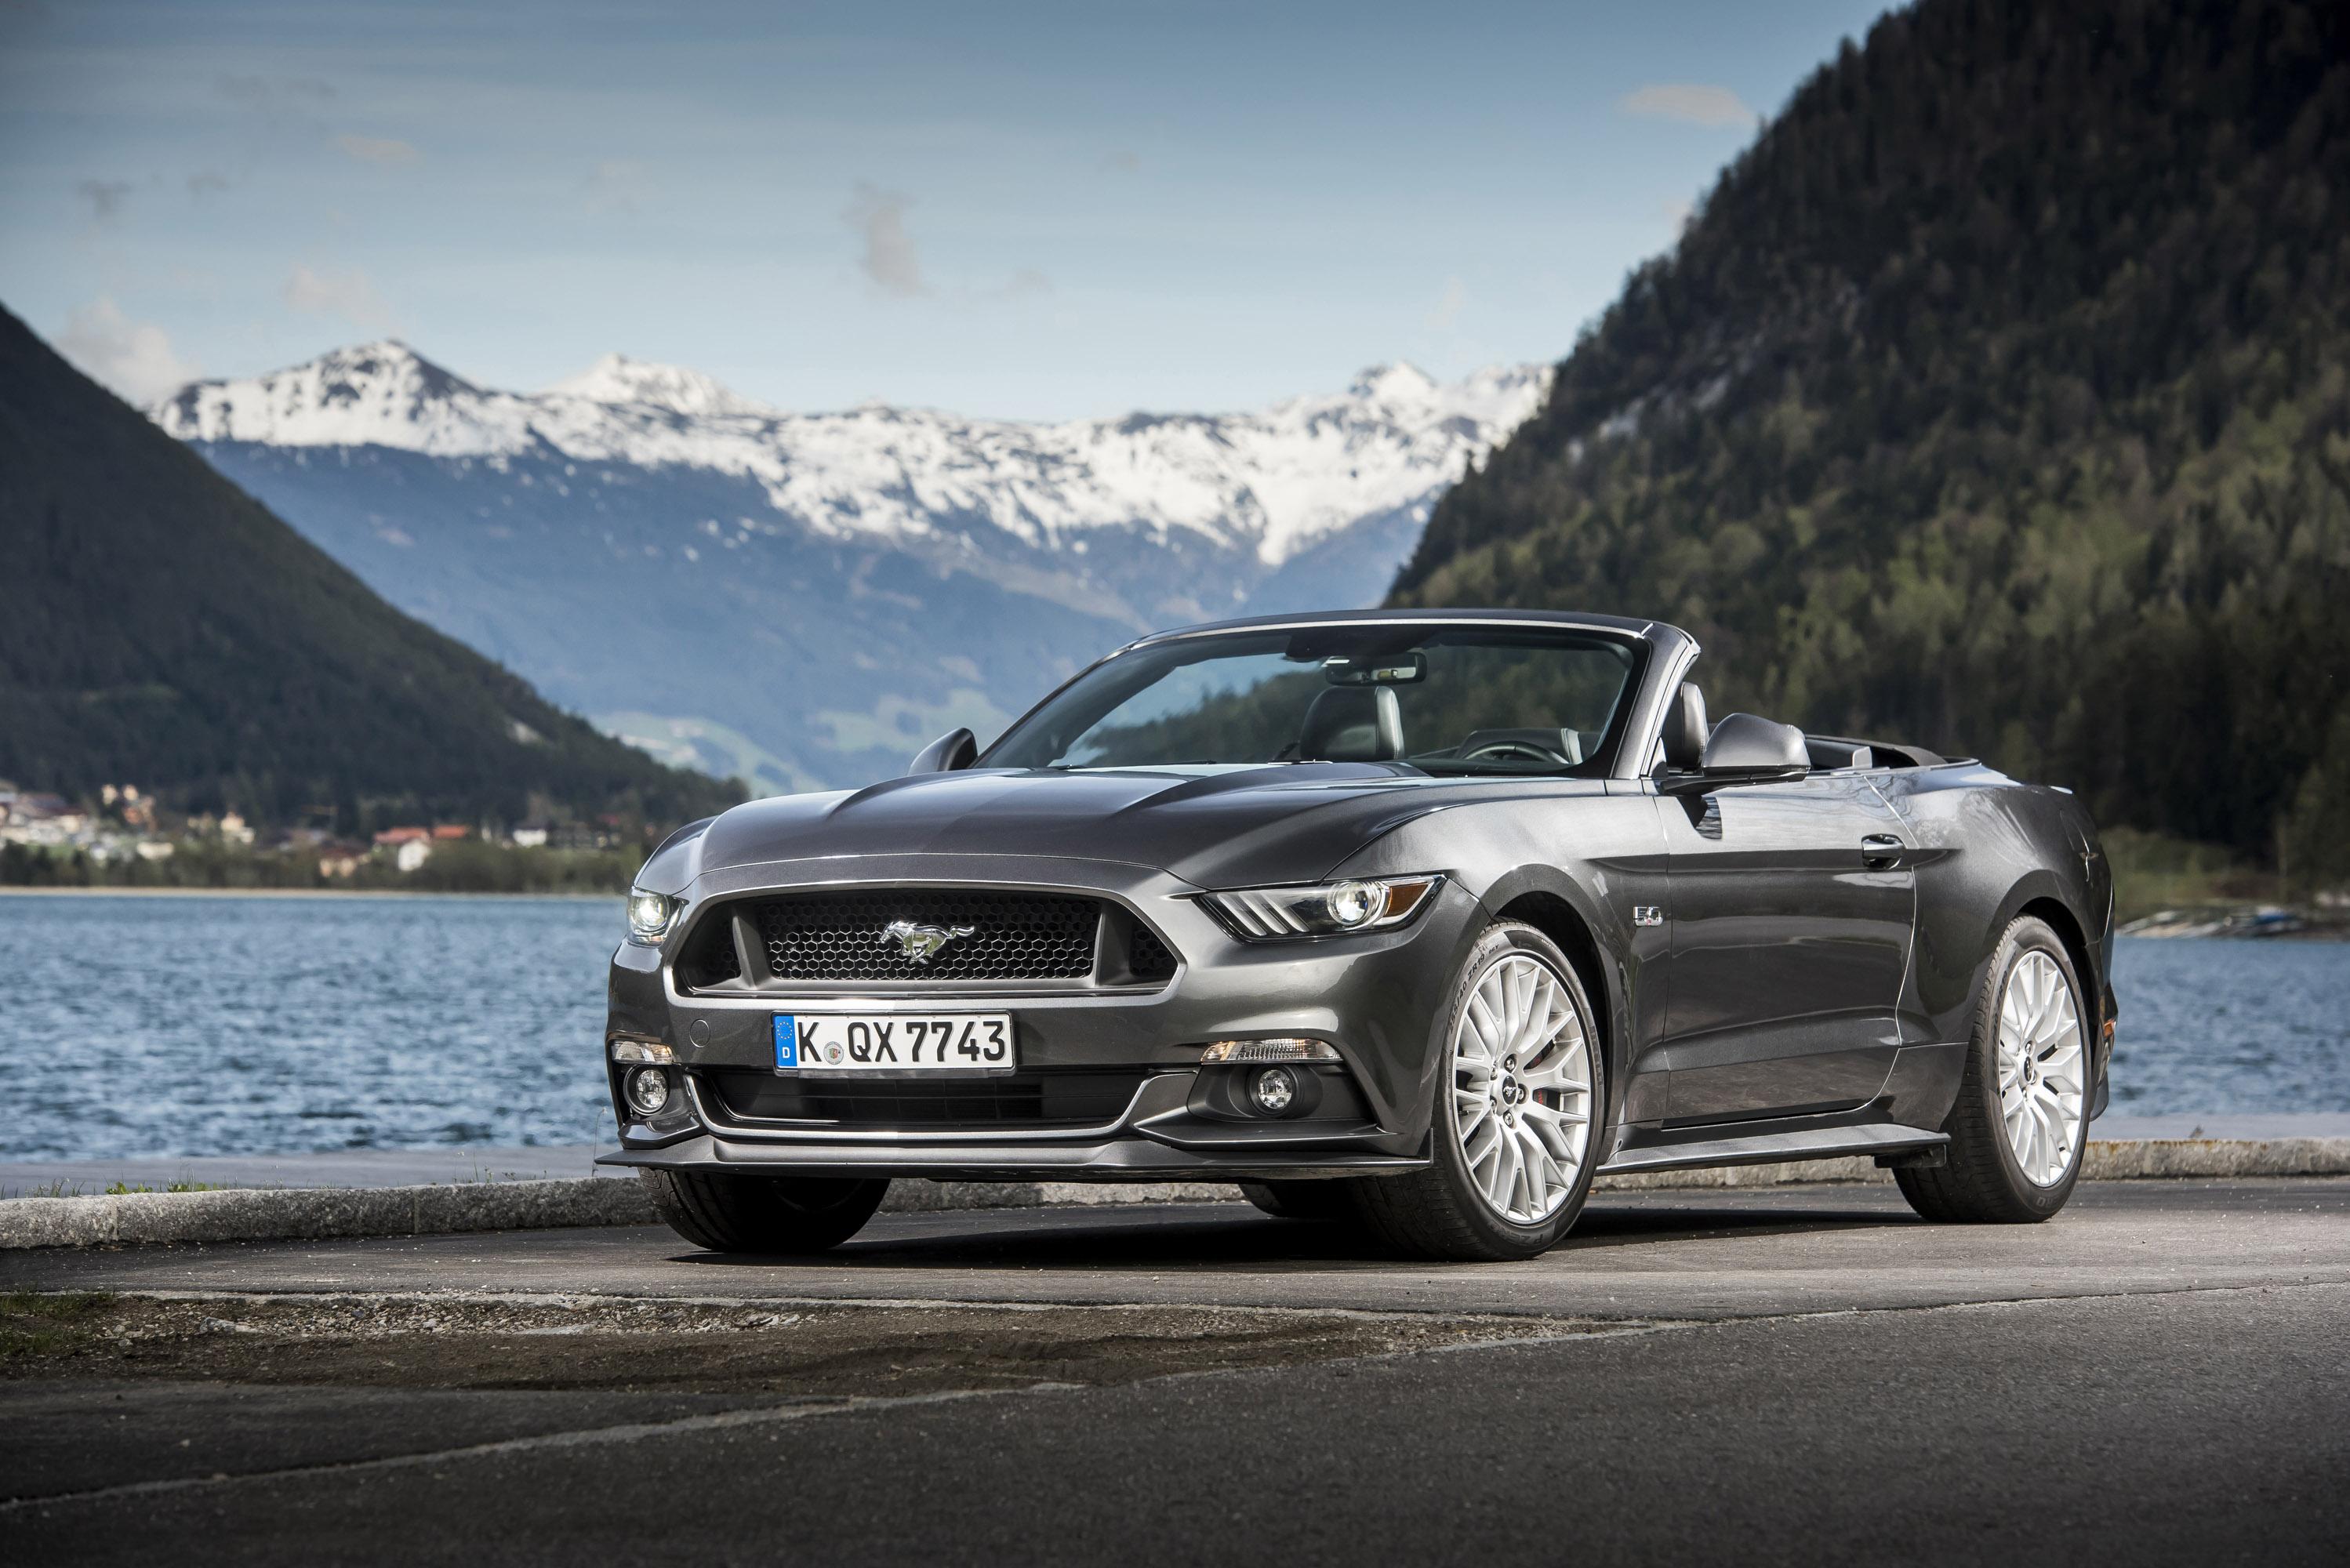 Ford Mustang Convertible EU-Version photo #1